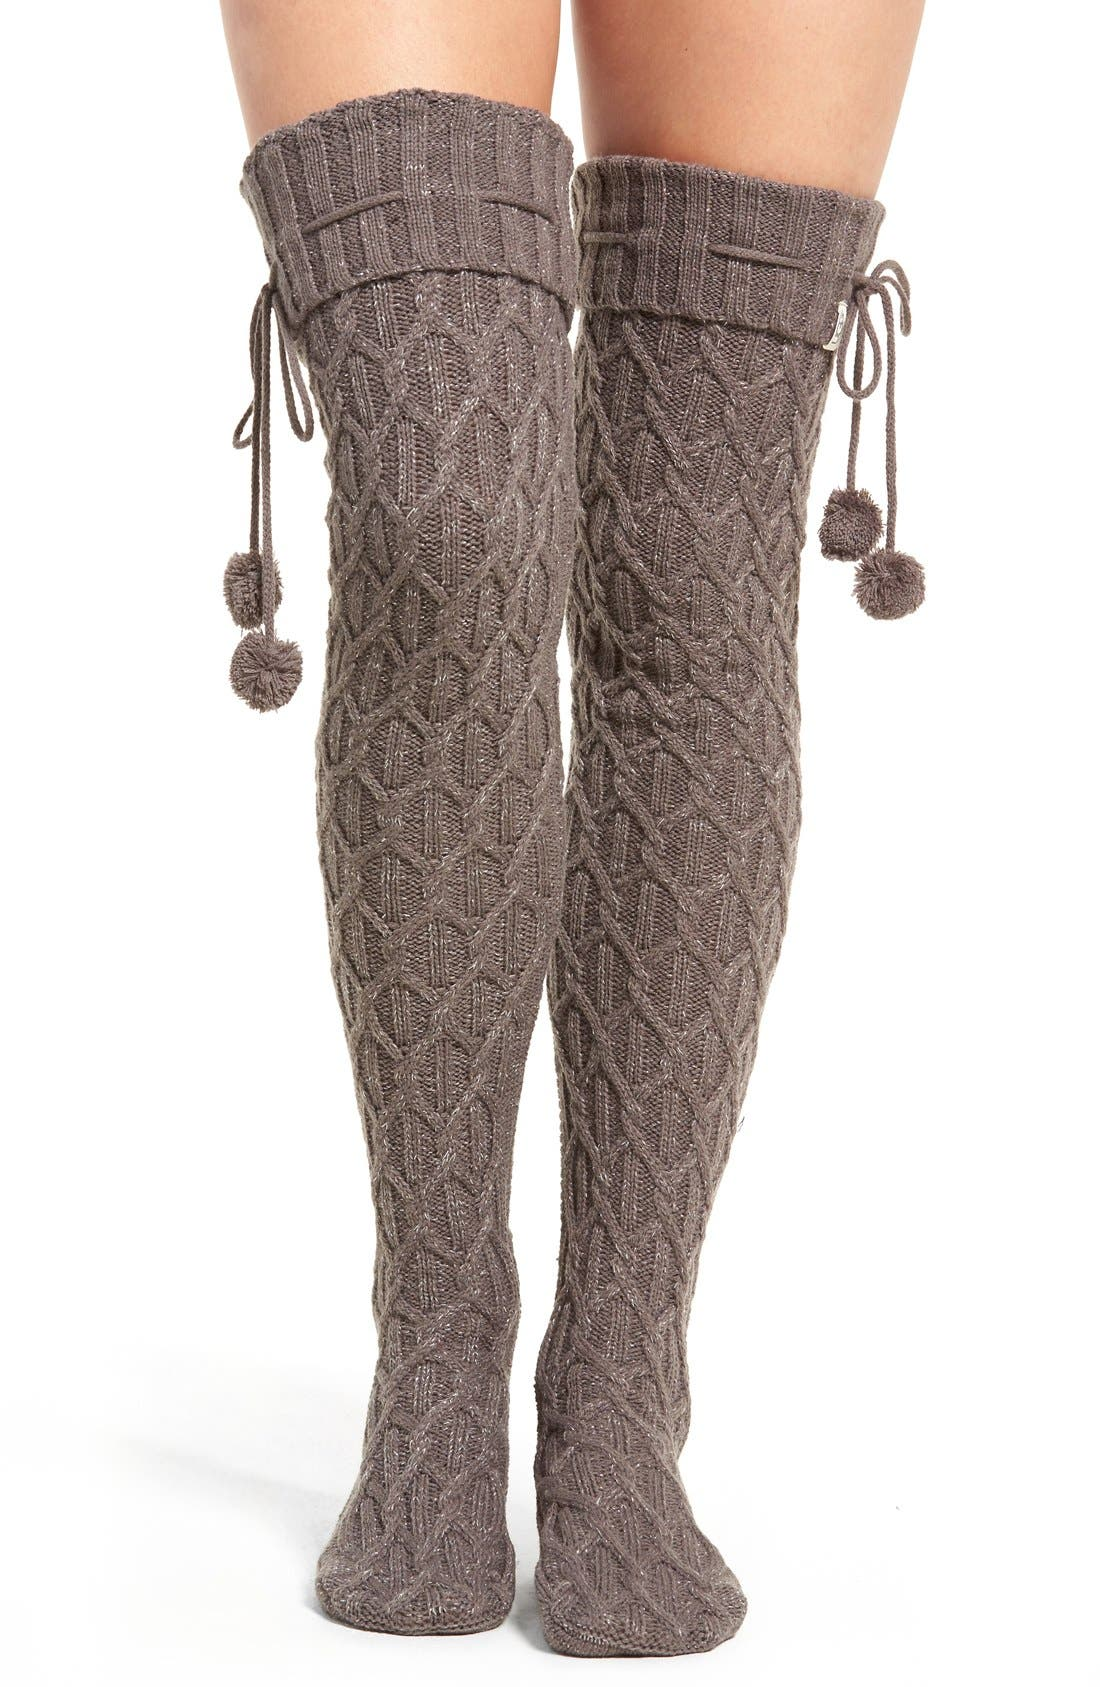 Sparkle Cable Knit Socks,                             Main thumbnail 1, color,                             020